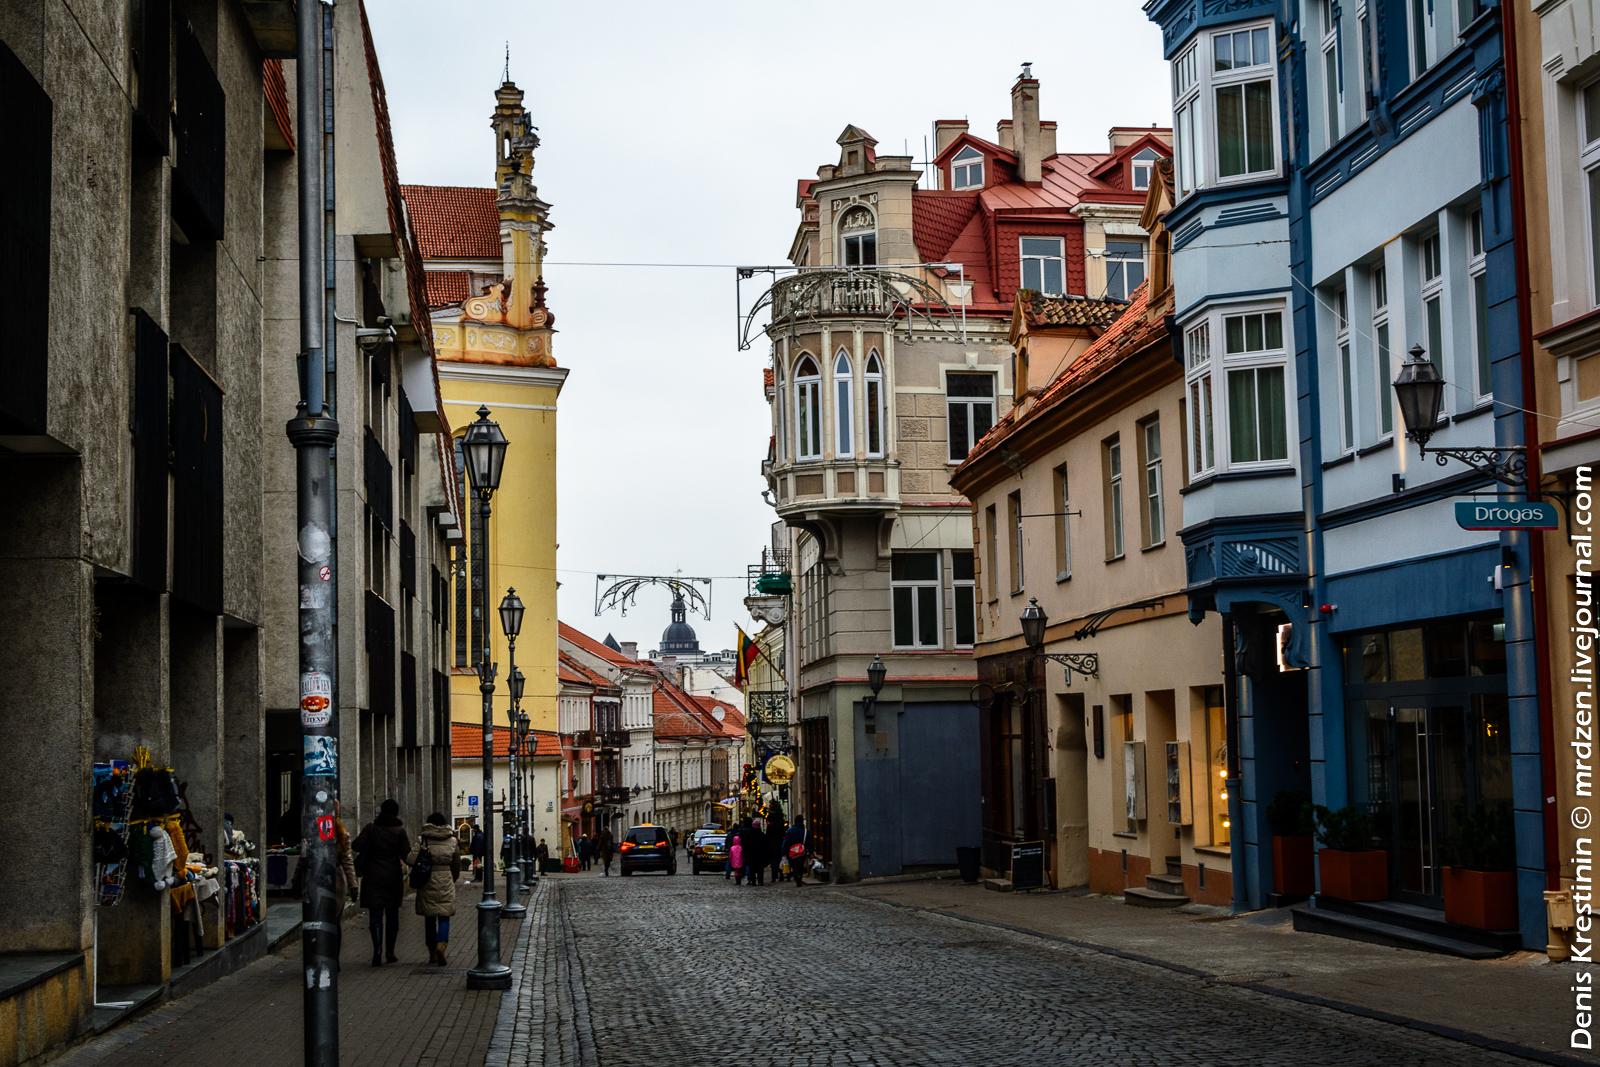 Вильнюс. Замковая улица (Пилес гатве).